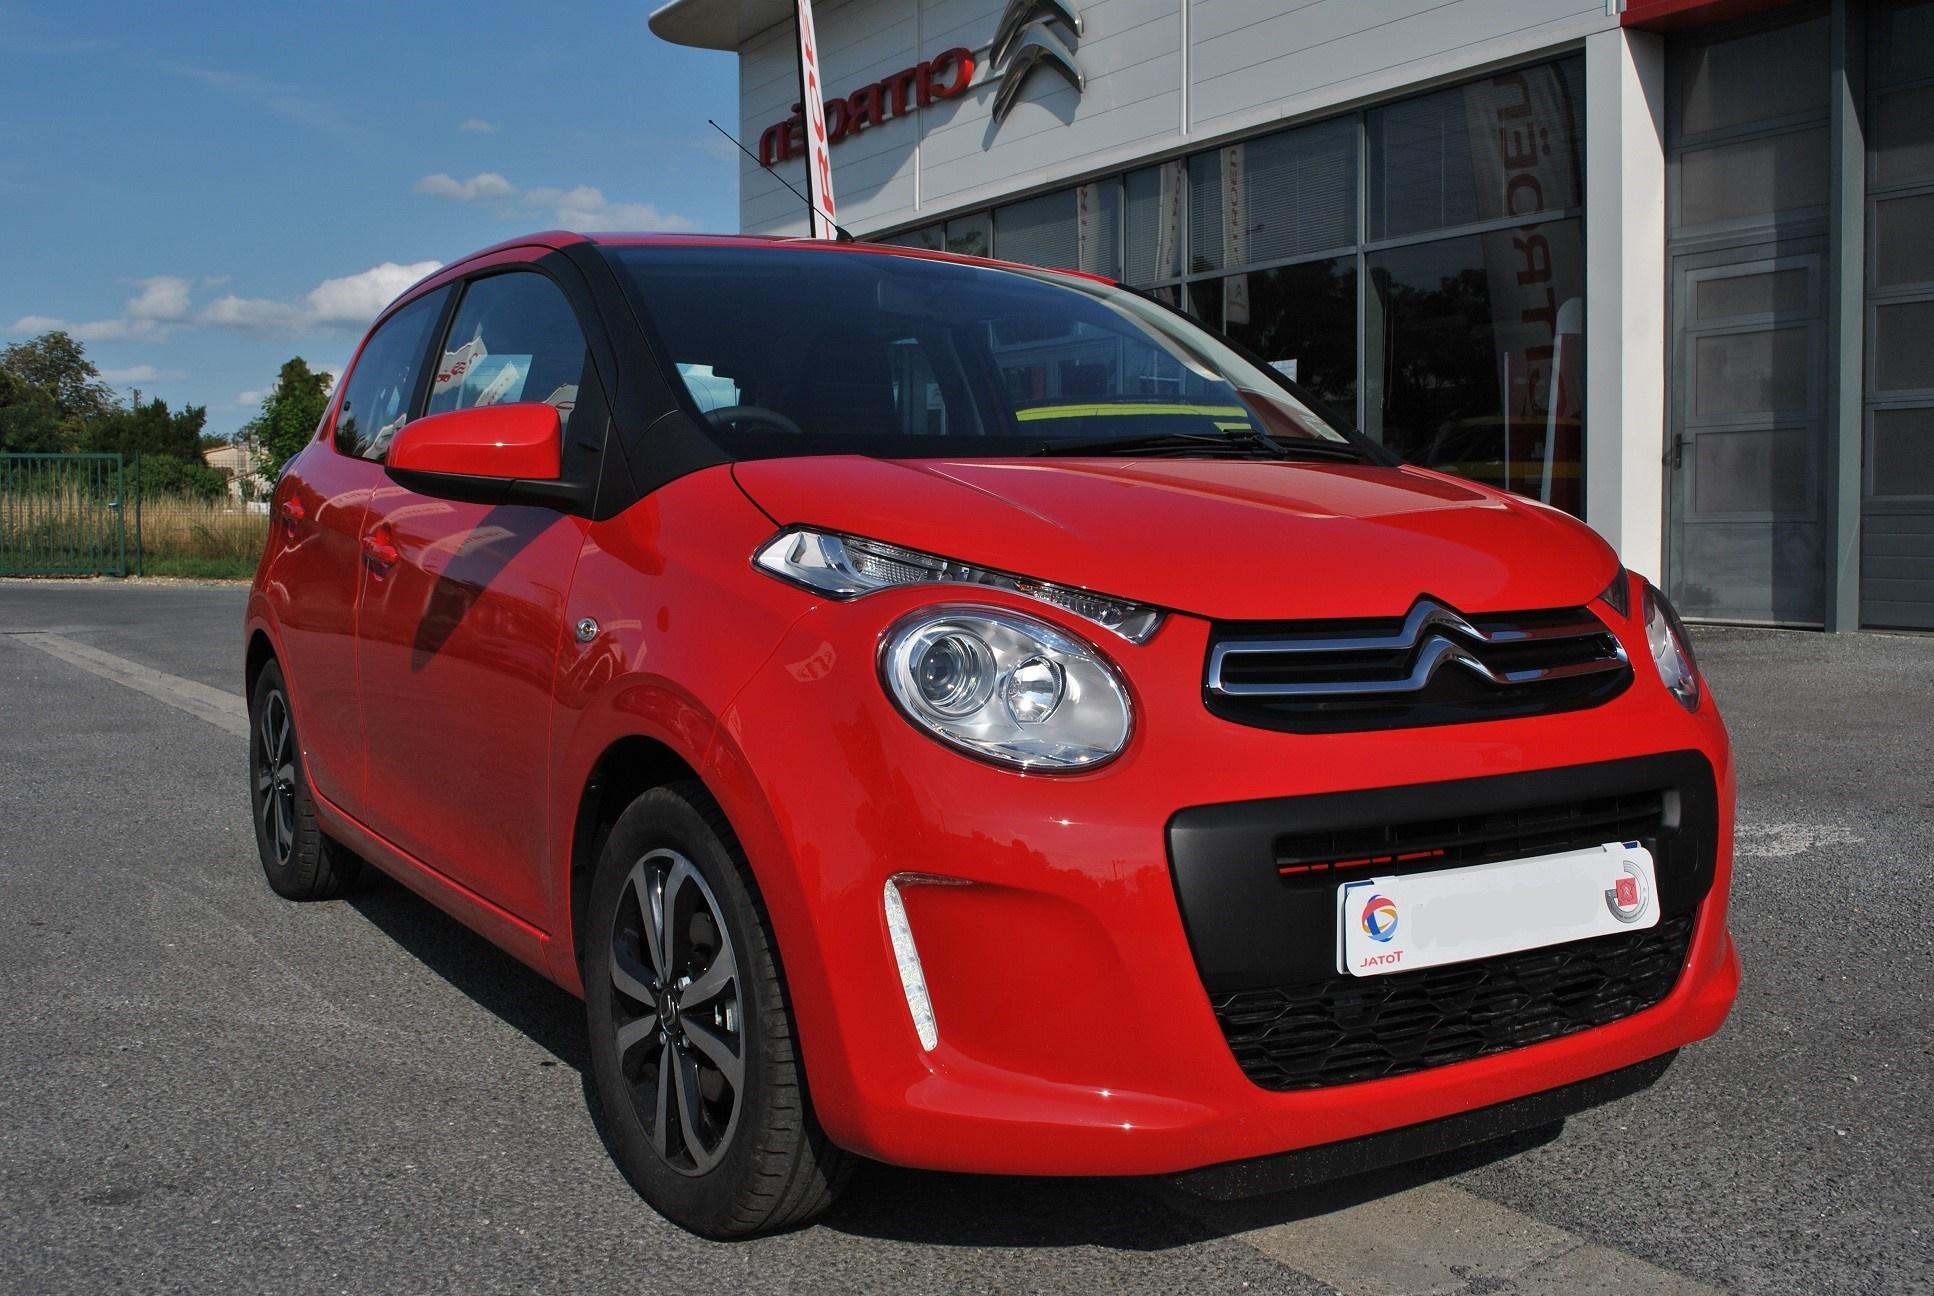 A-segment: Peugeot 108 | VW Up! | KIA Picanto